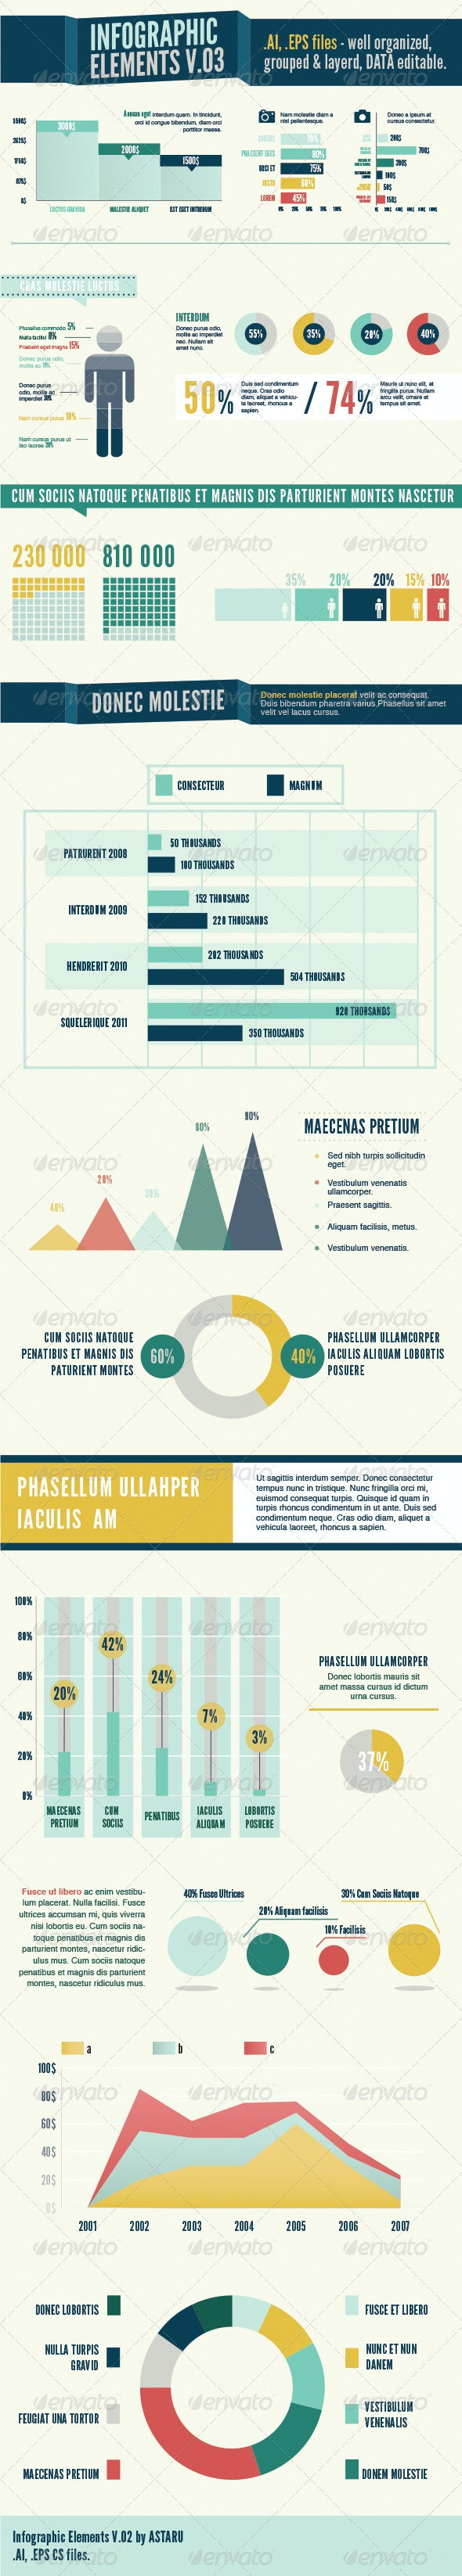 Infographic Elements V.03 - Business Conceptual